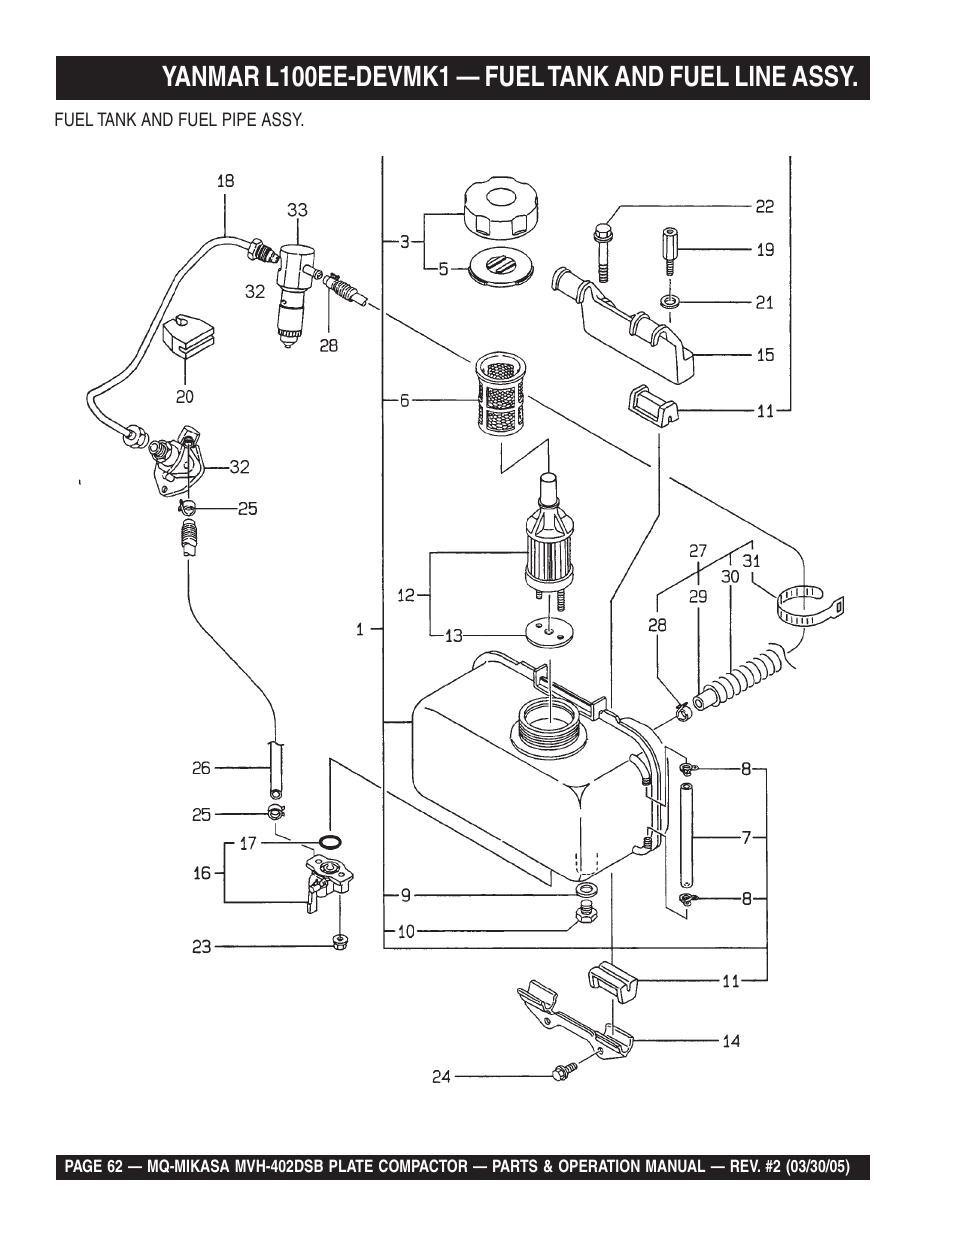 Multiquip Mikasa Reversible Plate Compactor Mvh 402dsb User